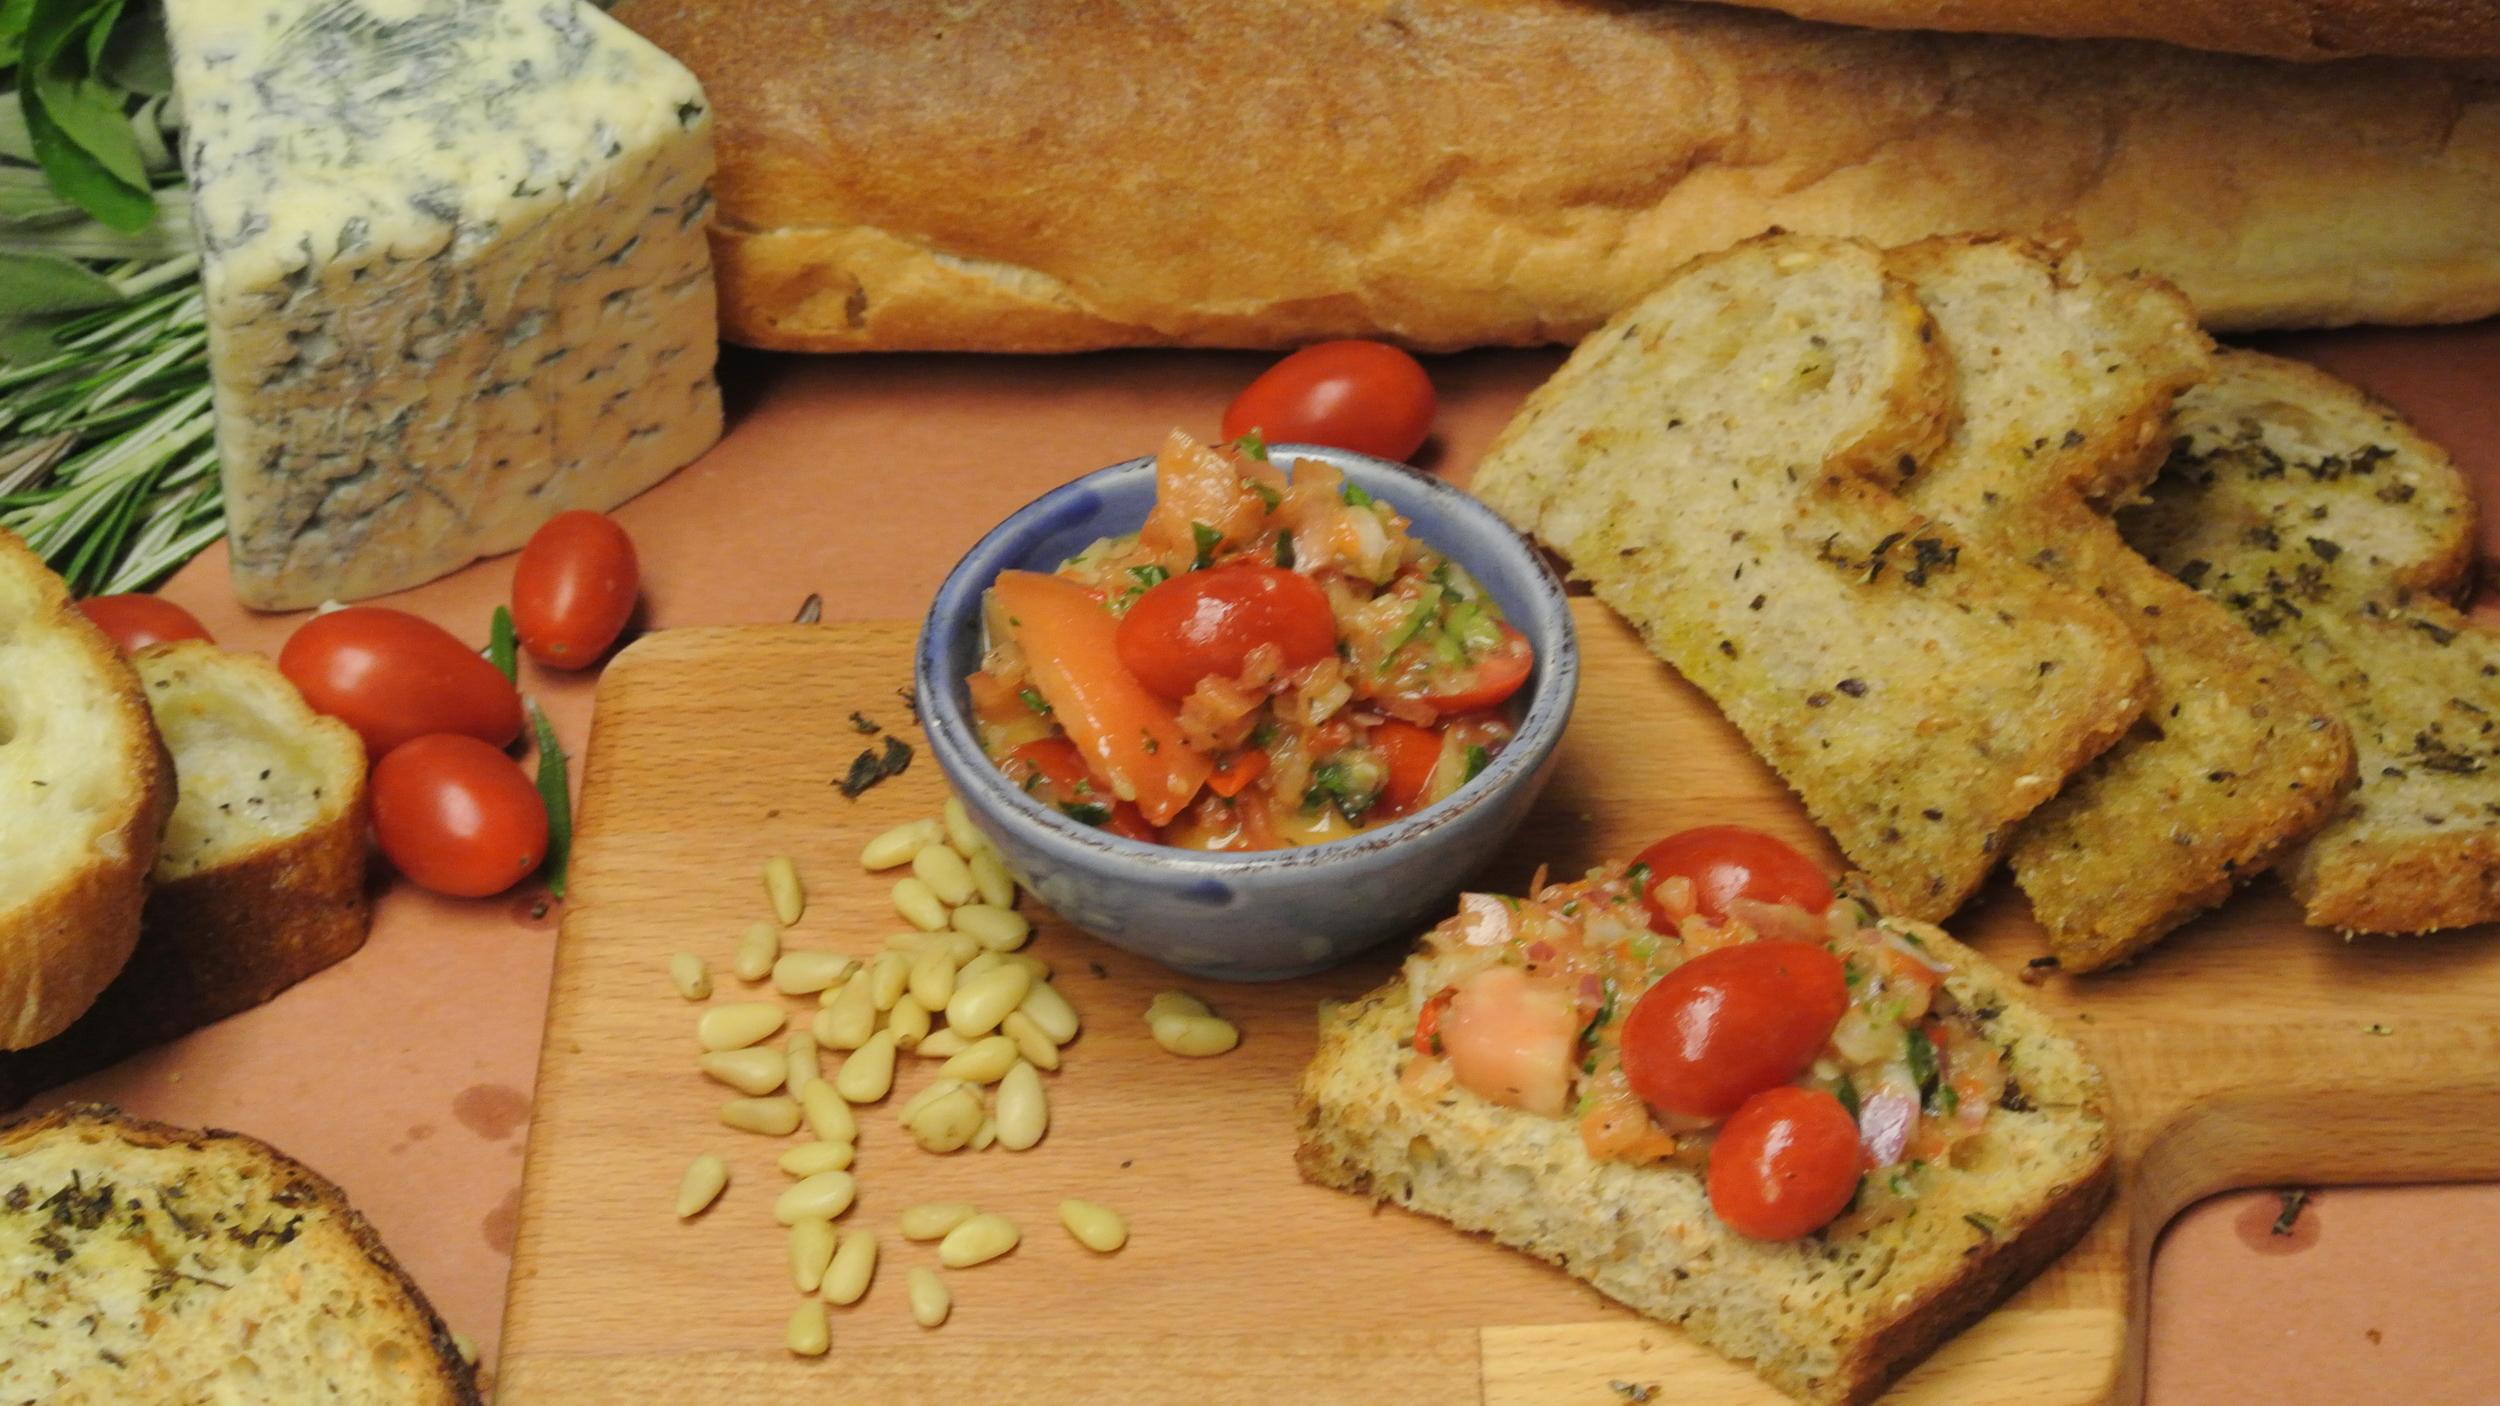 bruschetta di pomodoro- an Italian classic